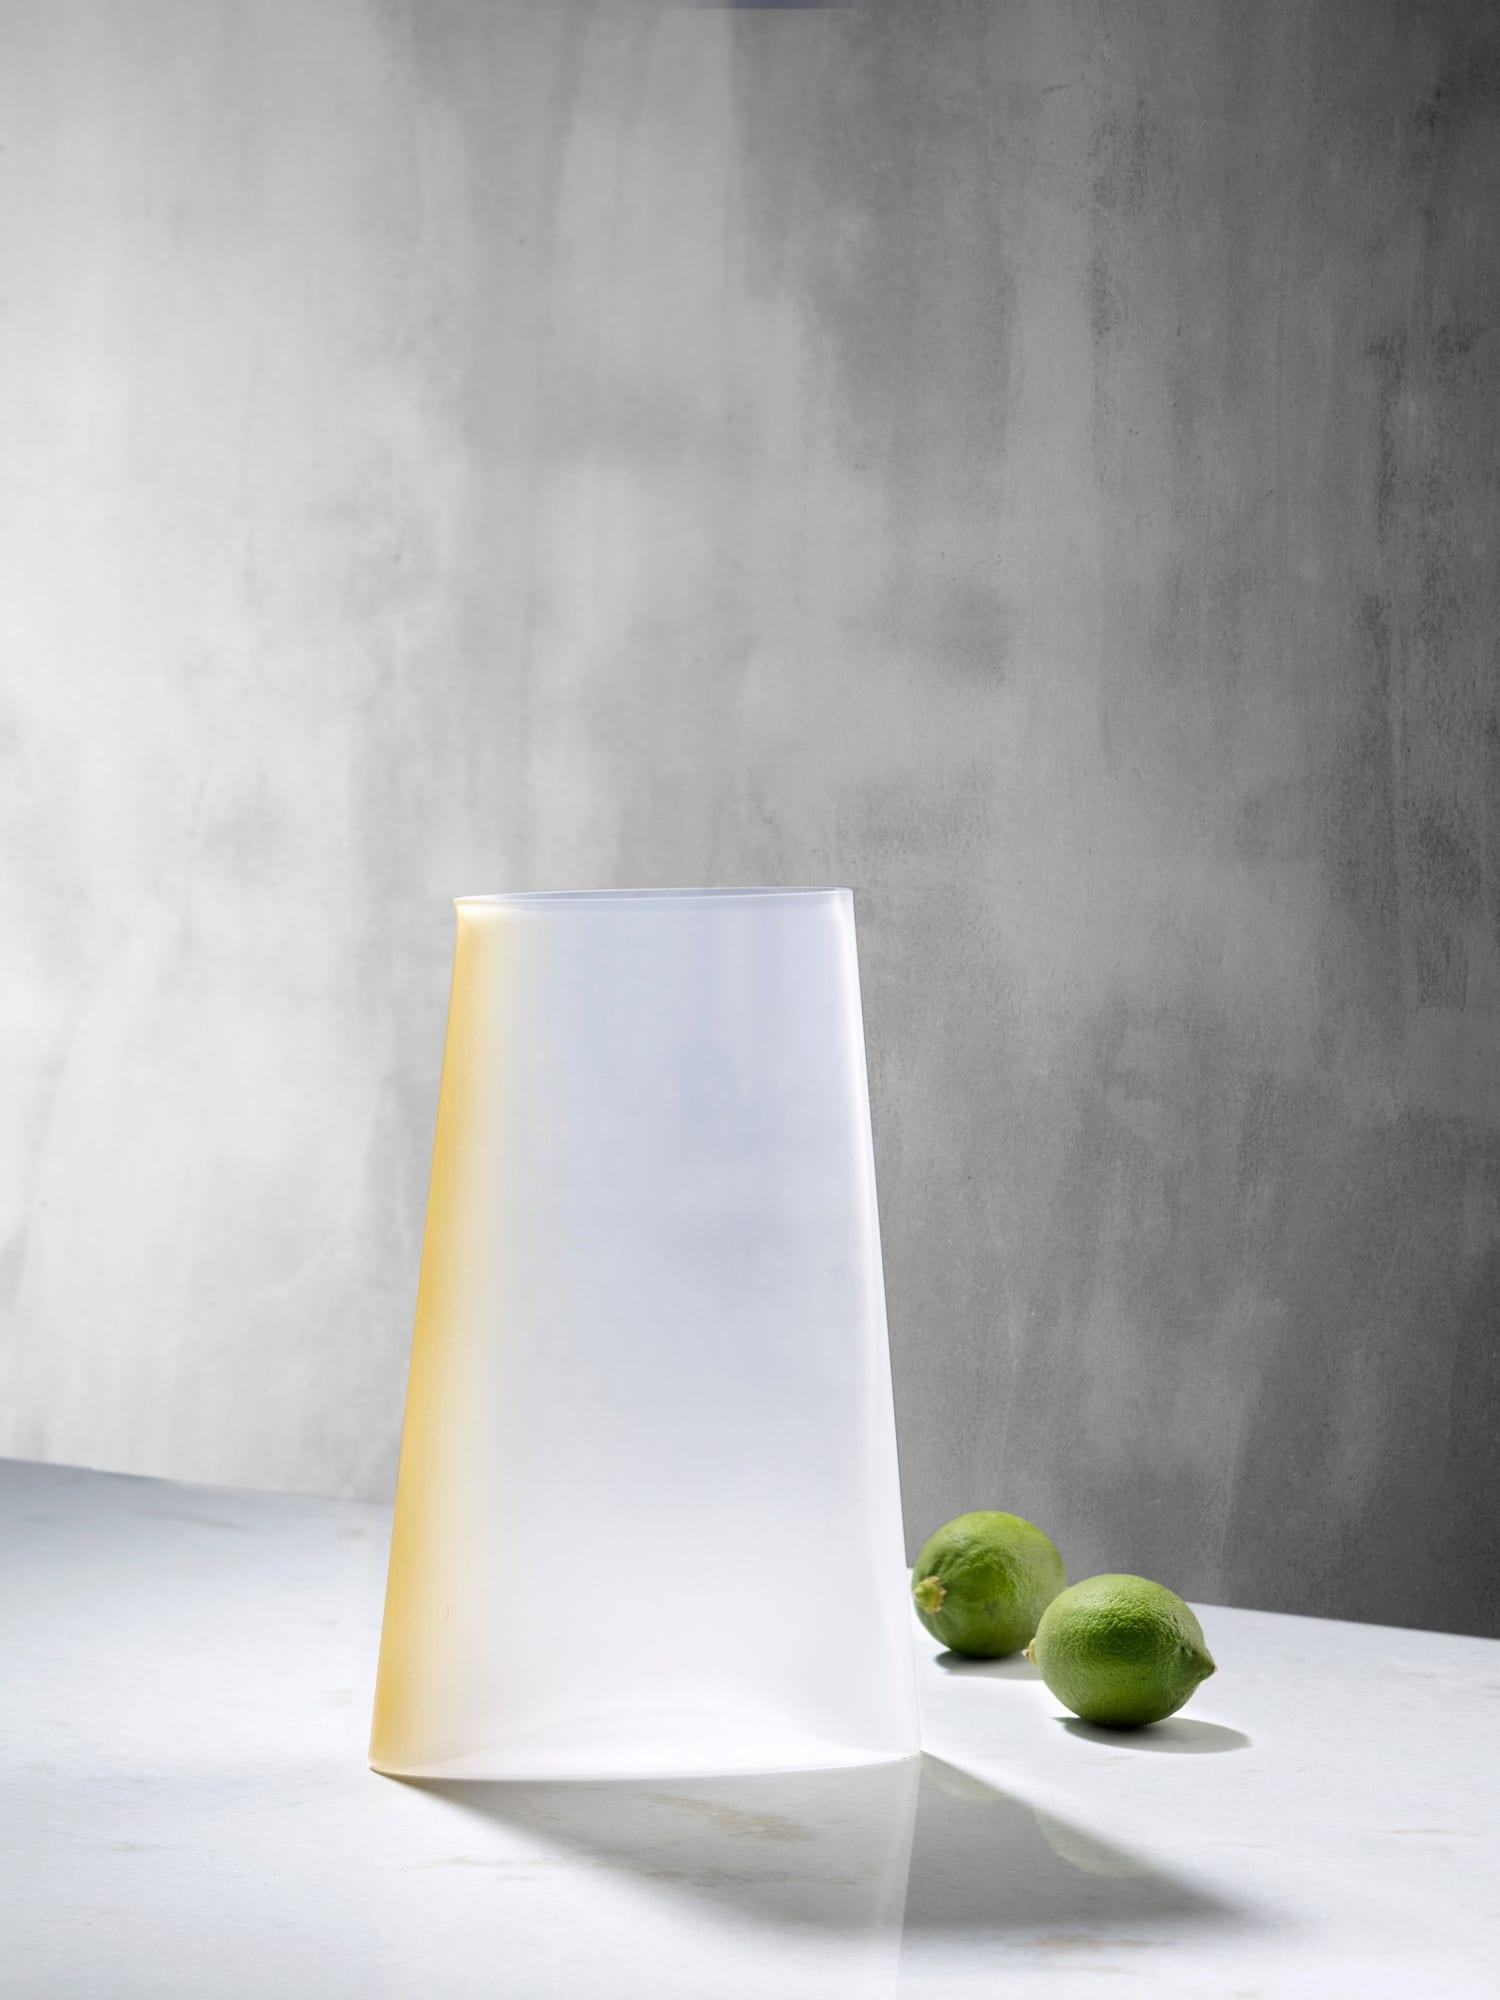 Nude Glassware by Formafantasma at Maison & Objet 2018 | Yellowtrace